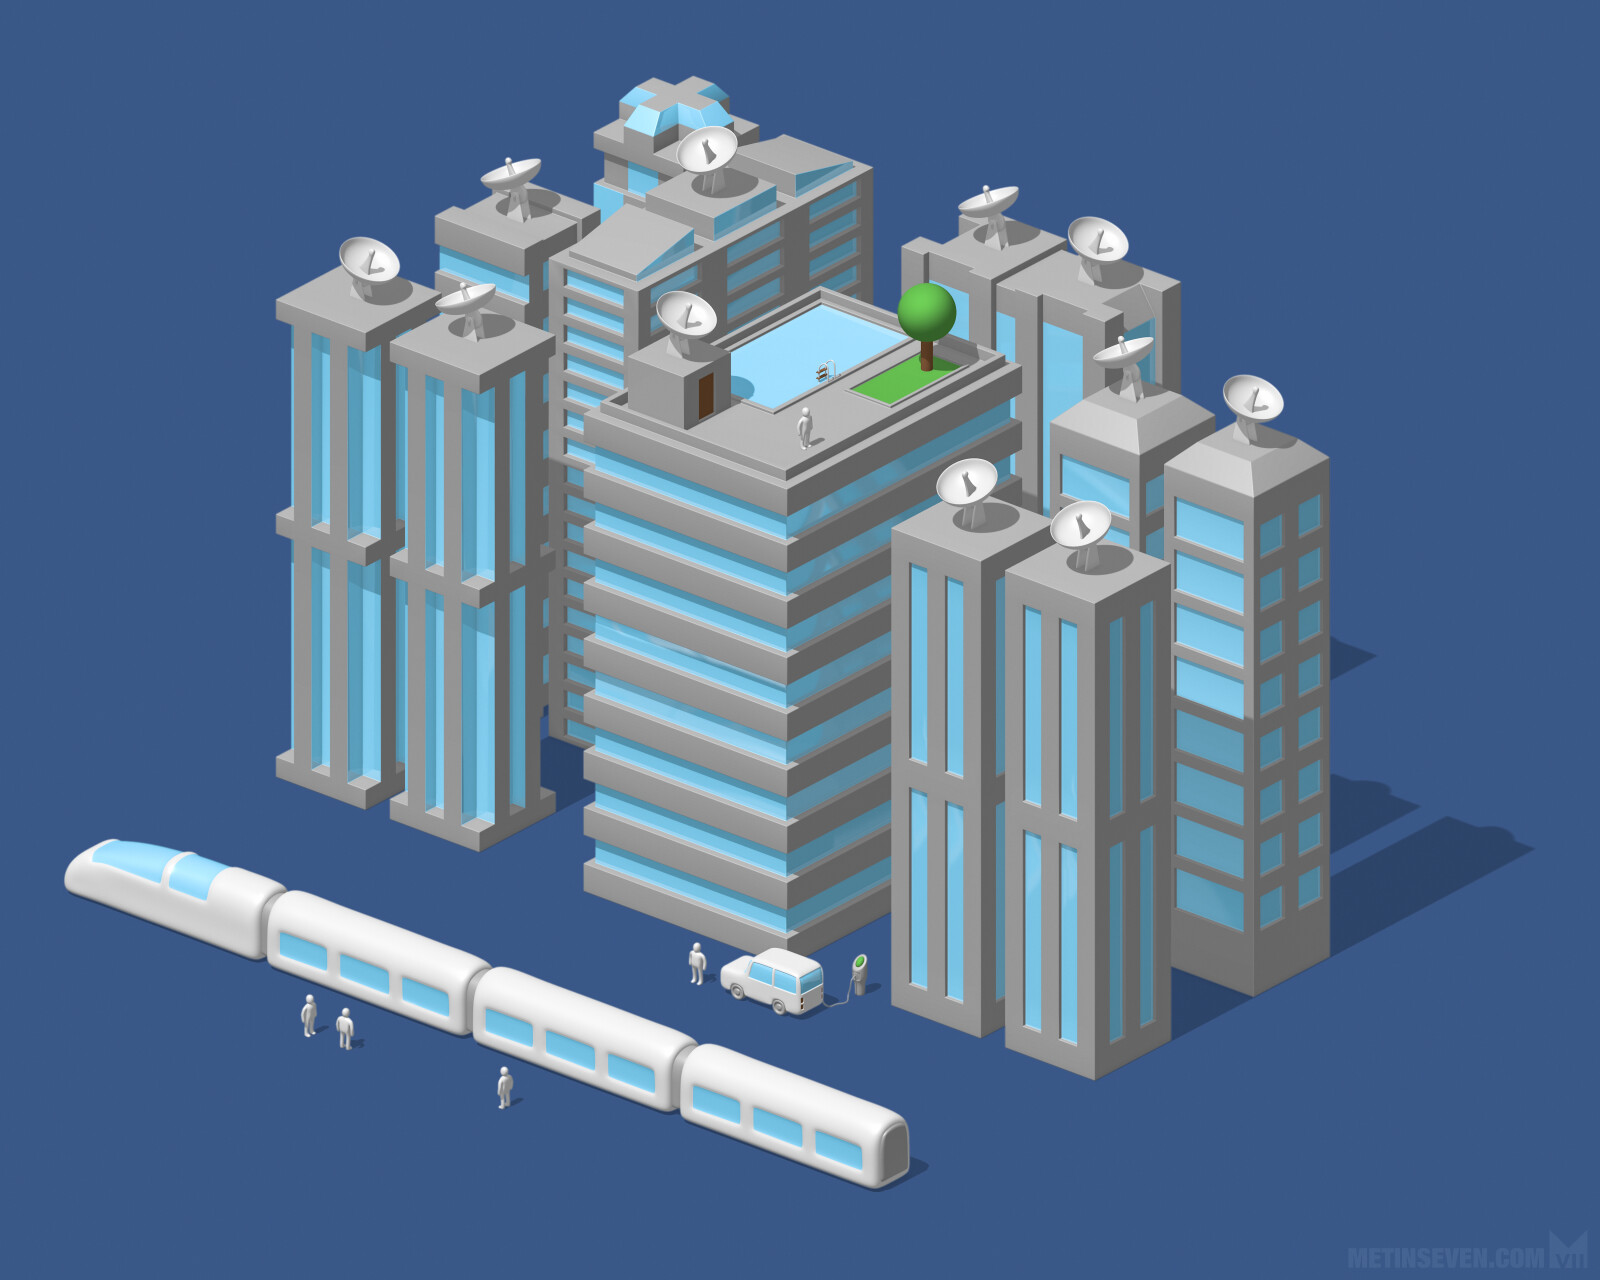 Stylized isometric illustration of a futuristic city